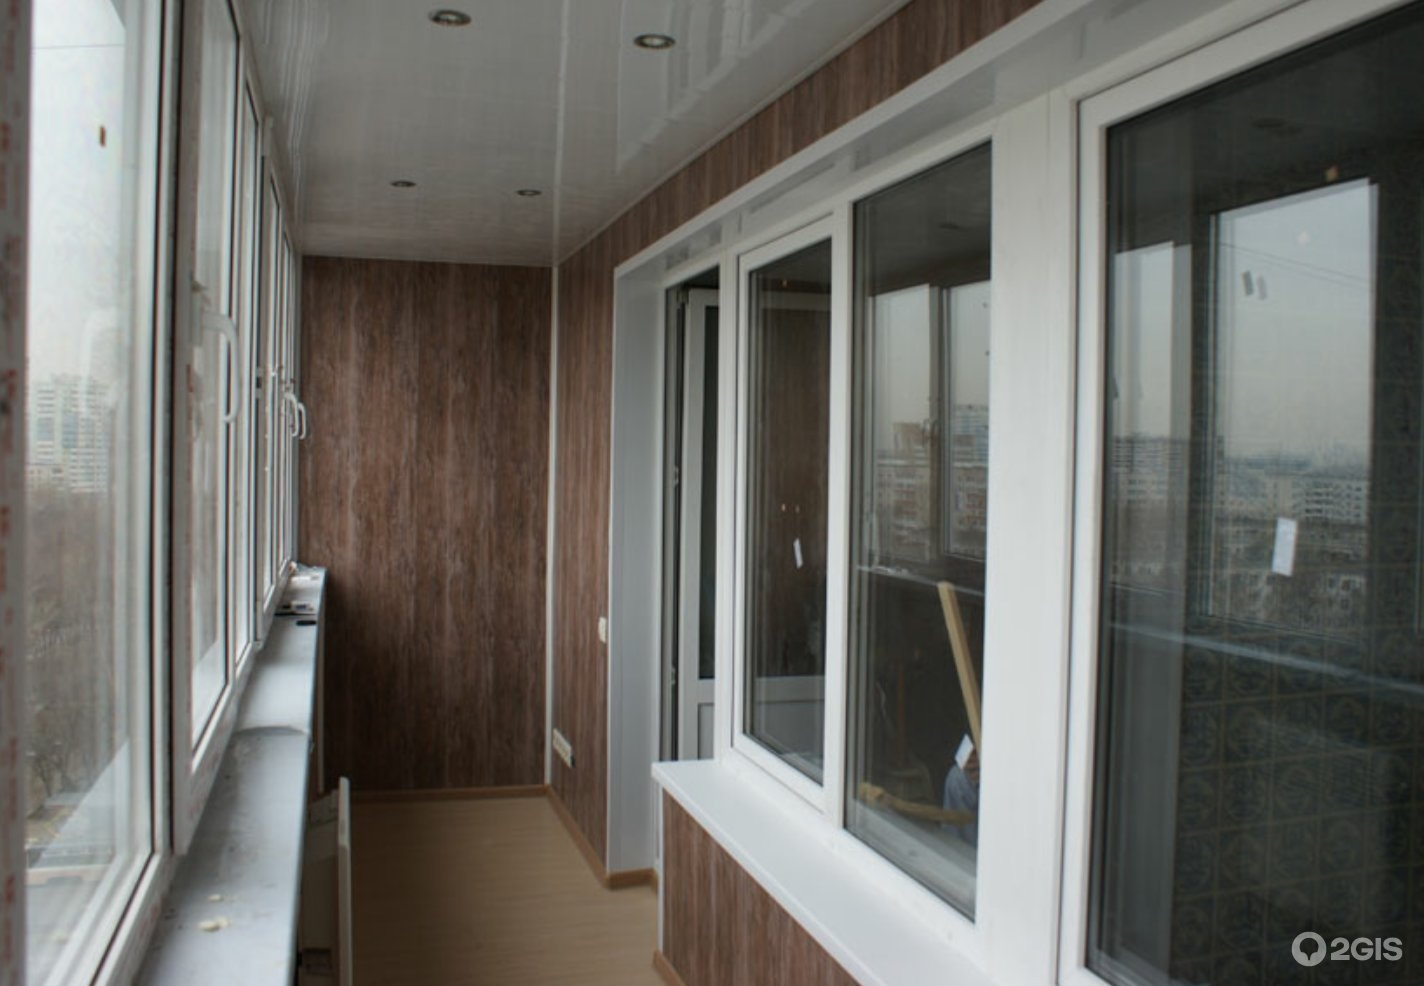 Остекление и отделка балкона мдф панелями.